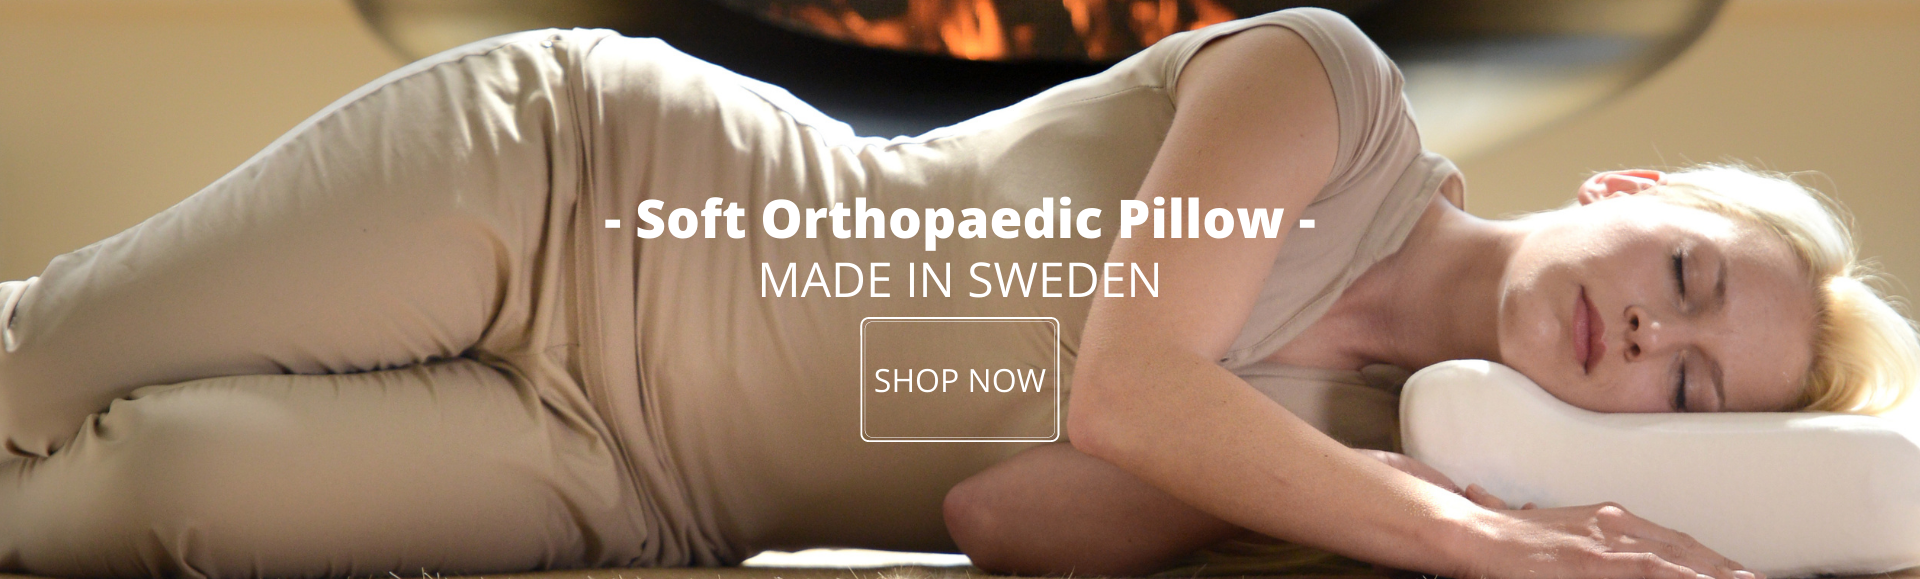 Soft Orthopaedic Pillow